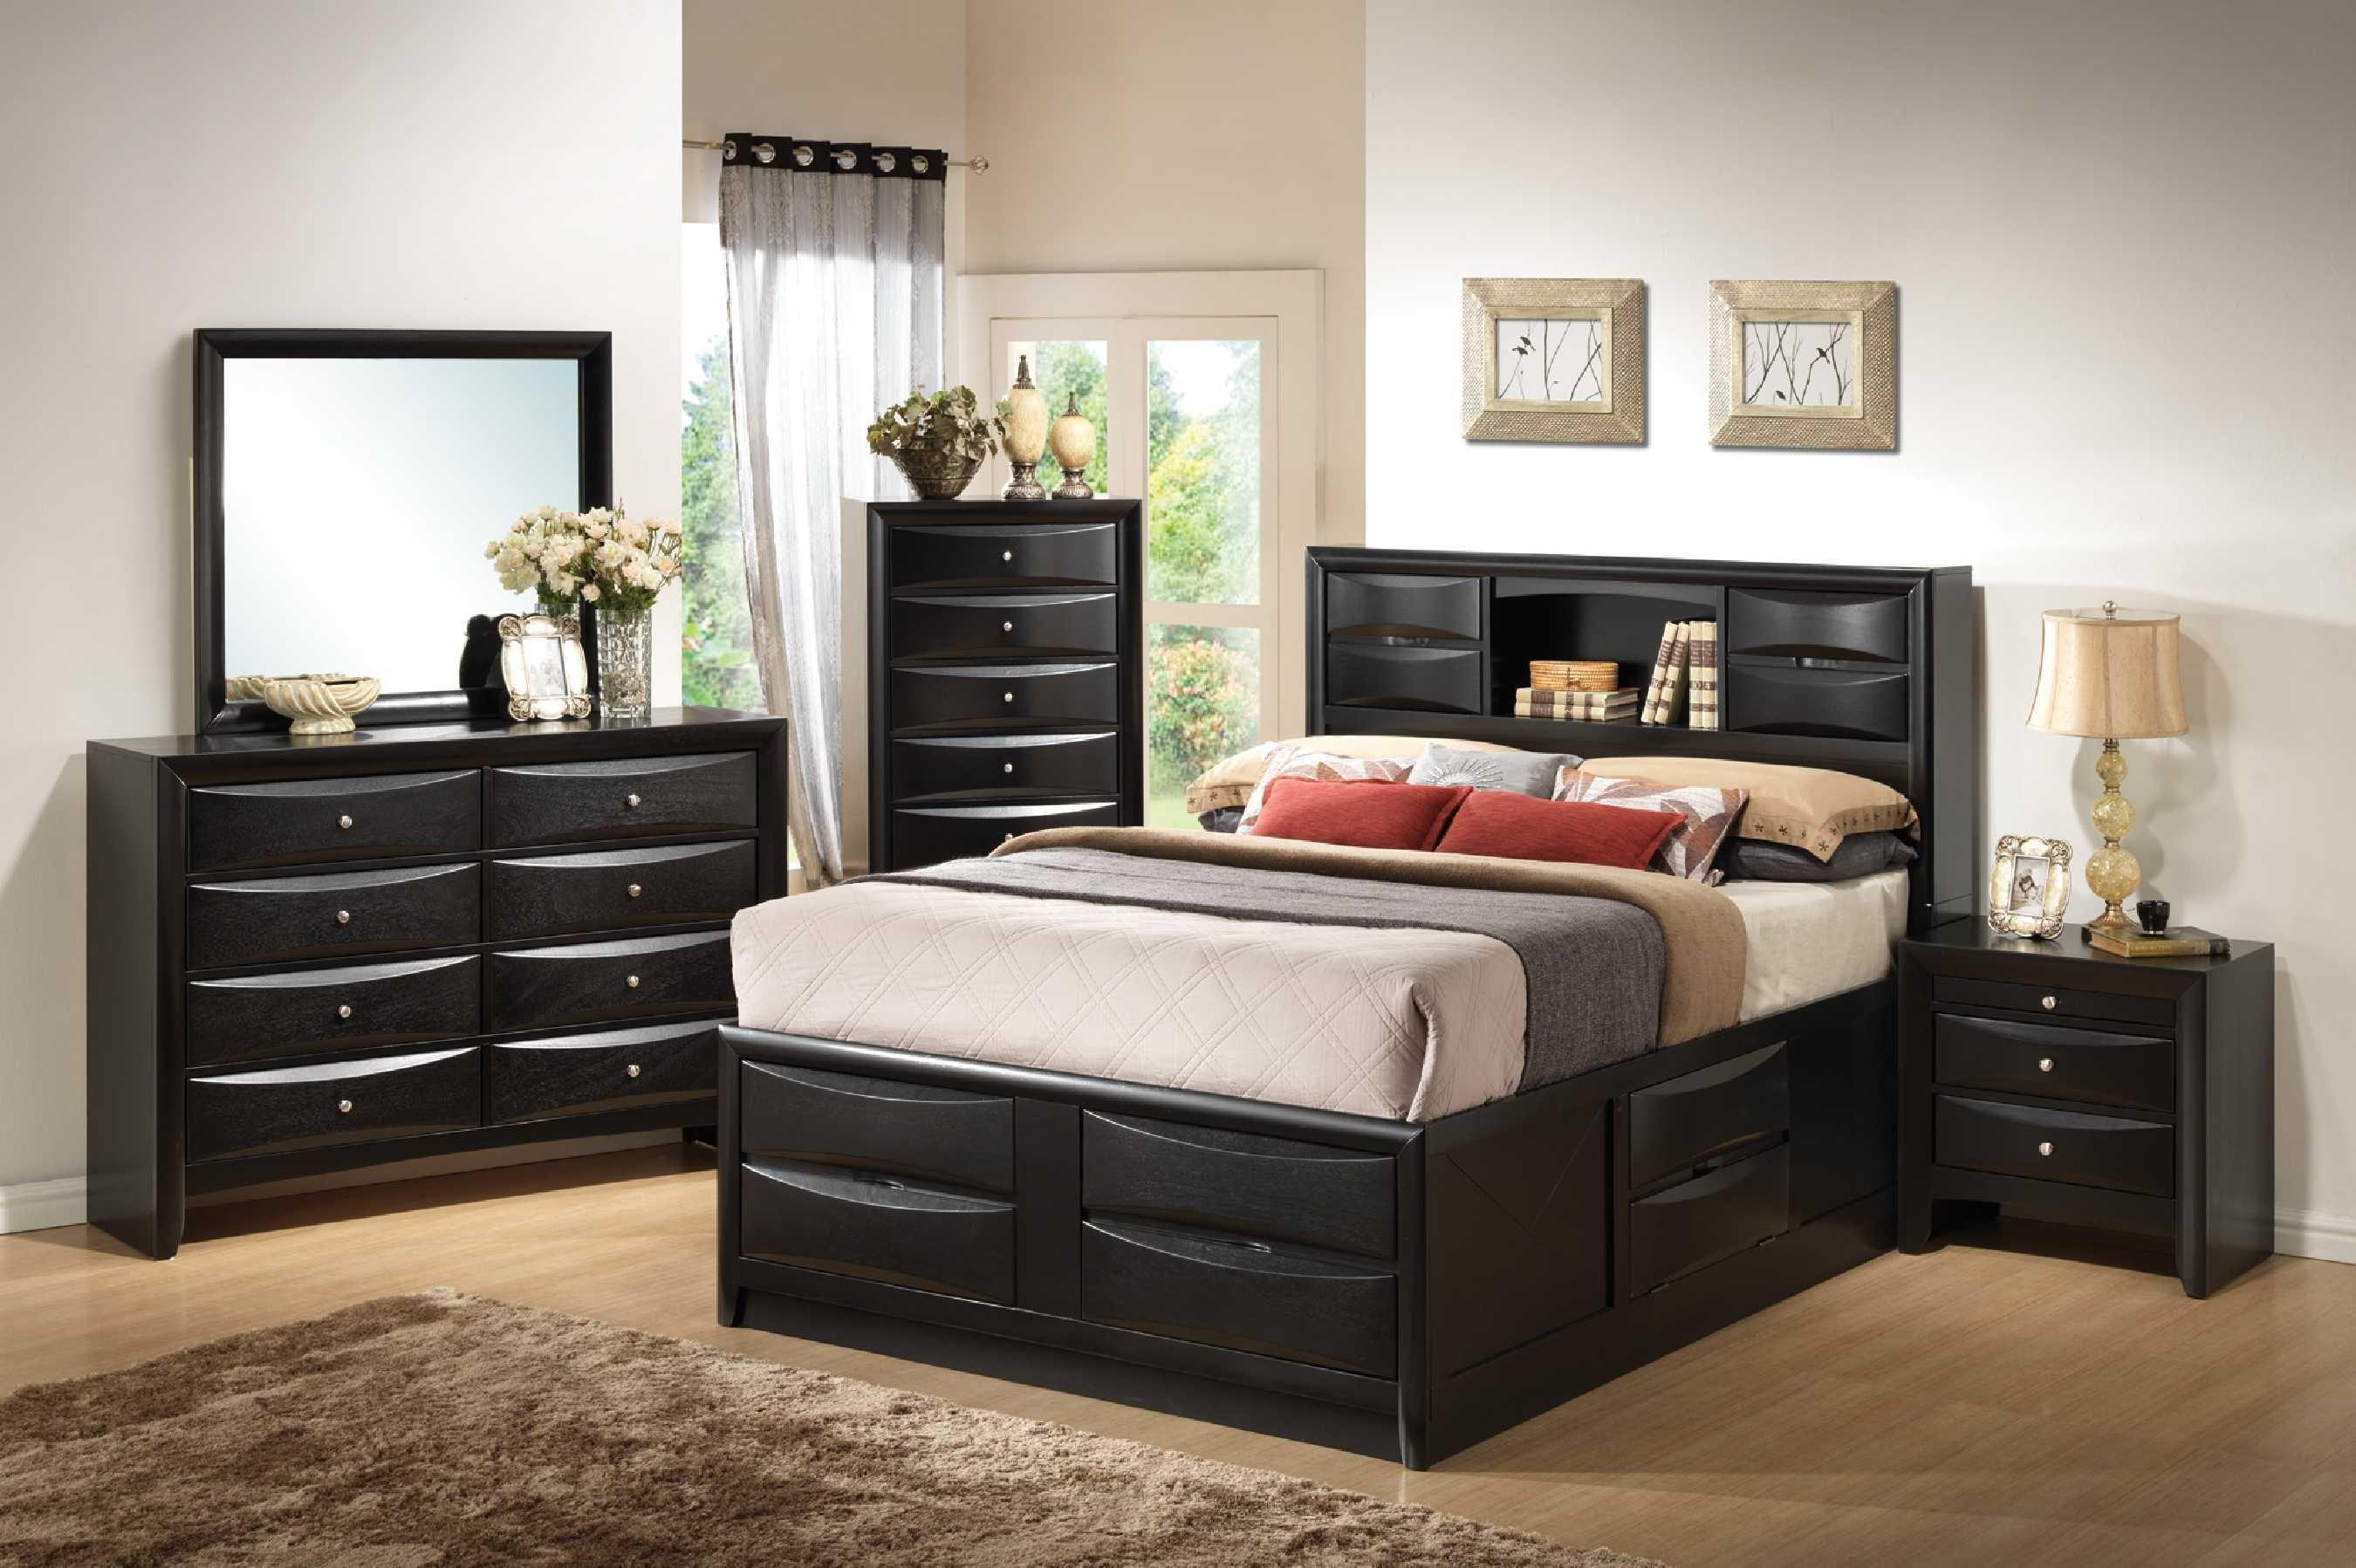 Modern Black Dresser With Mirror Ideas Http Middlechildmarketing